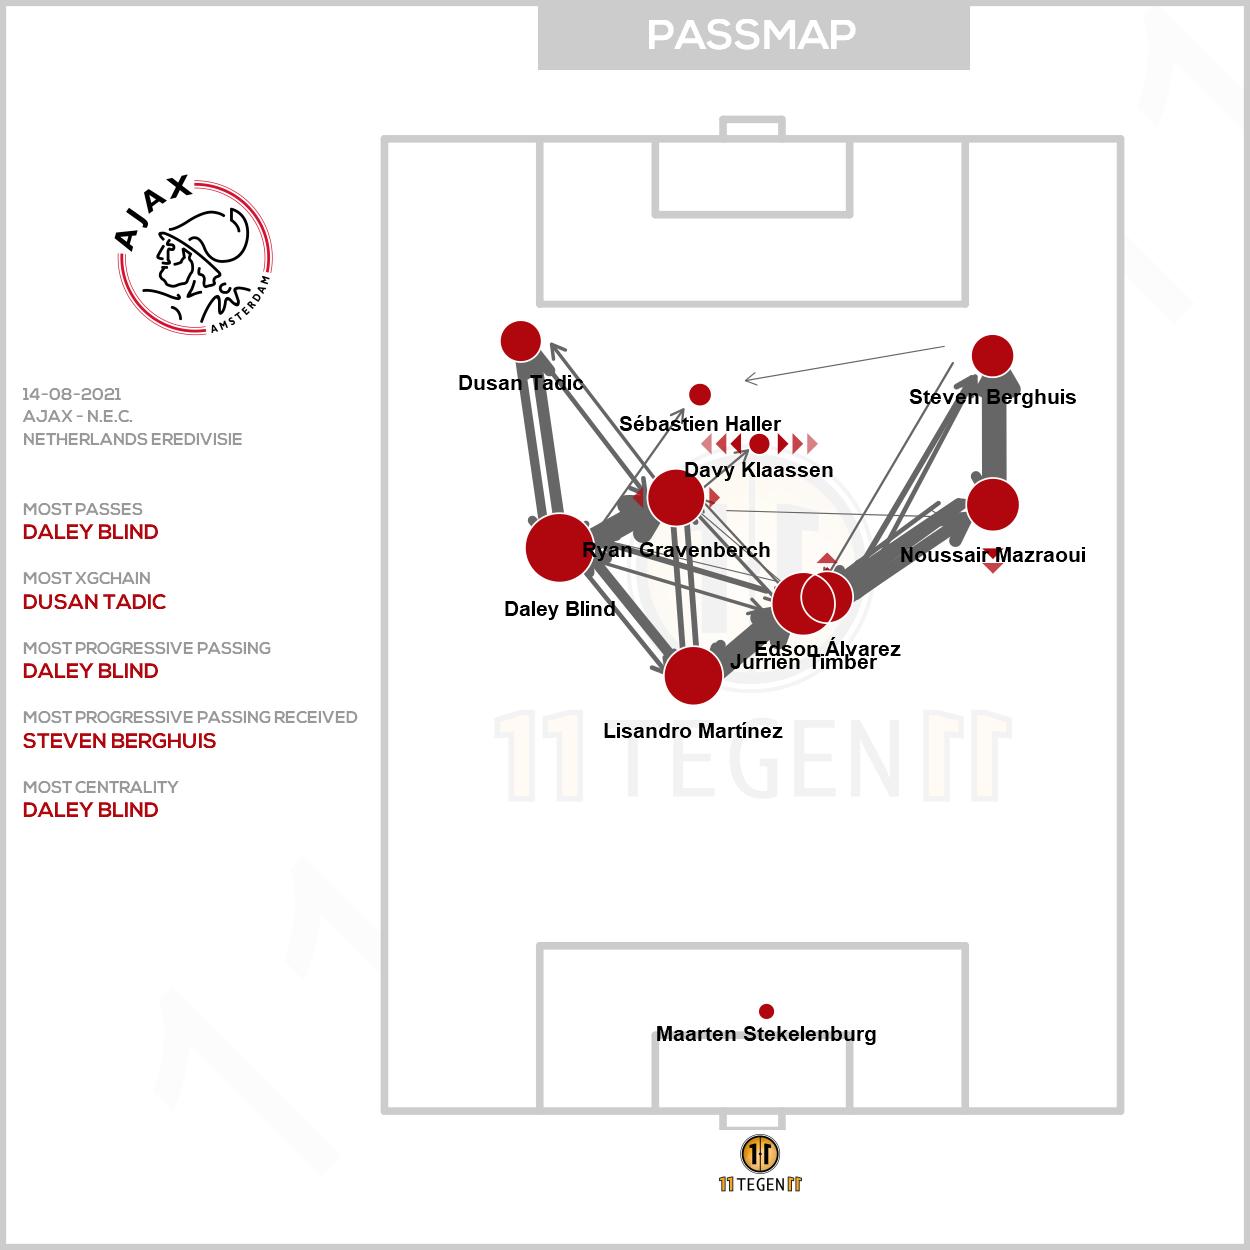 2021 08 14 Passmap Ajax Ajax 5 0 N.E.C.